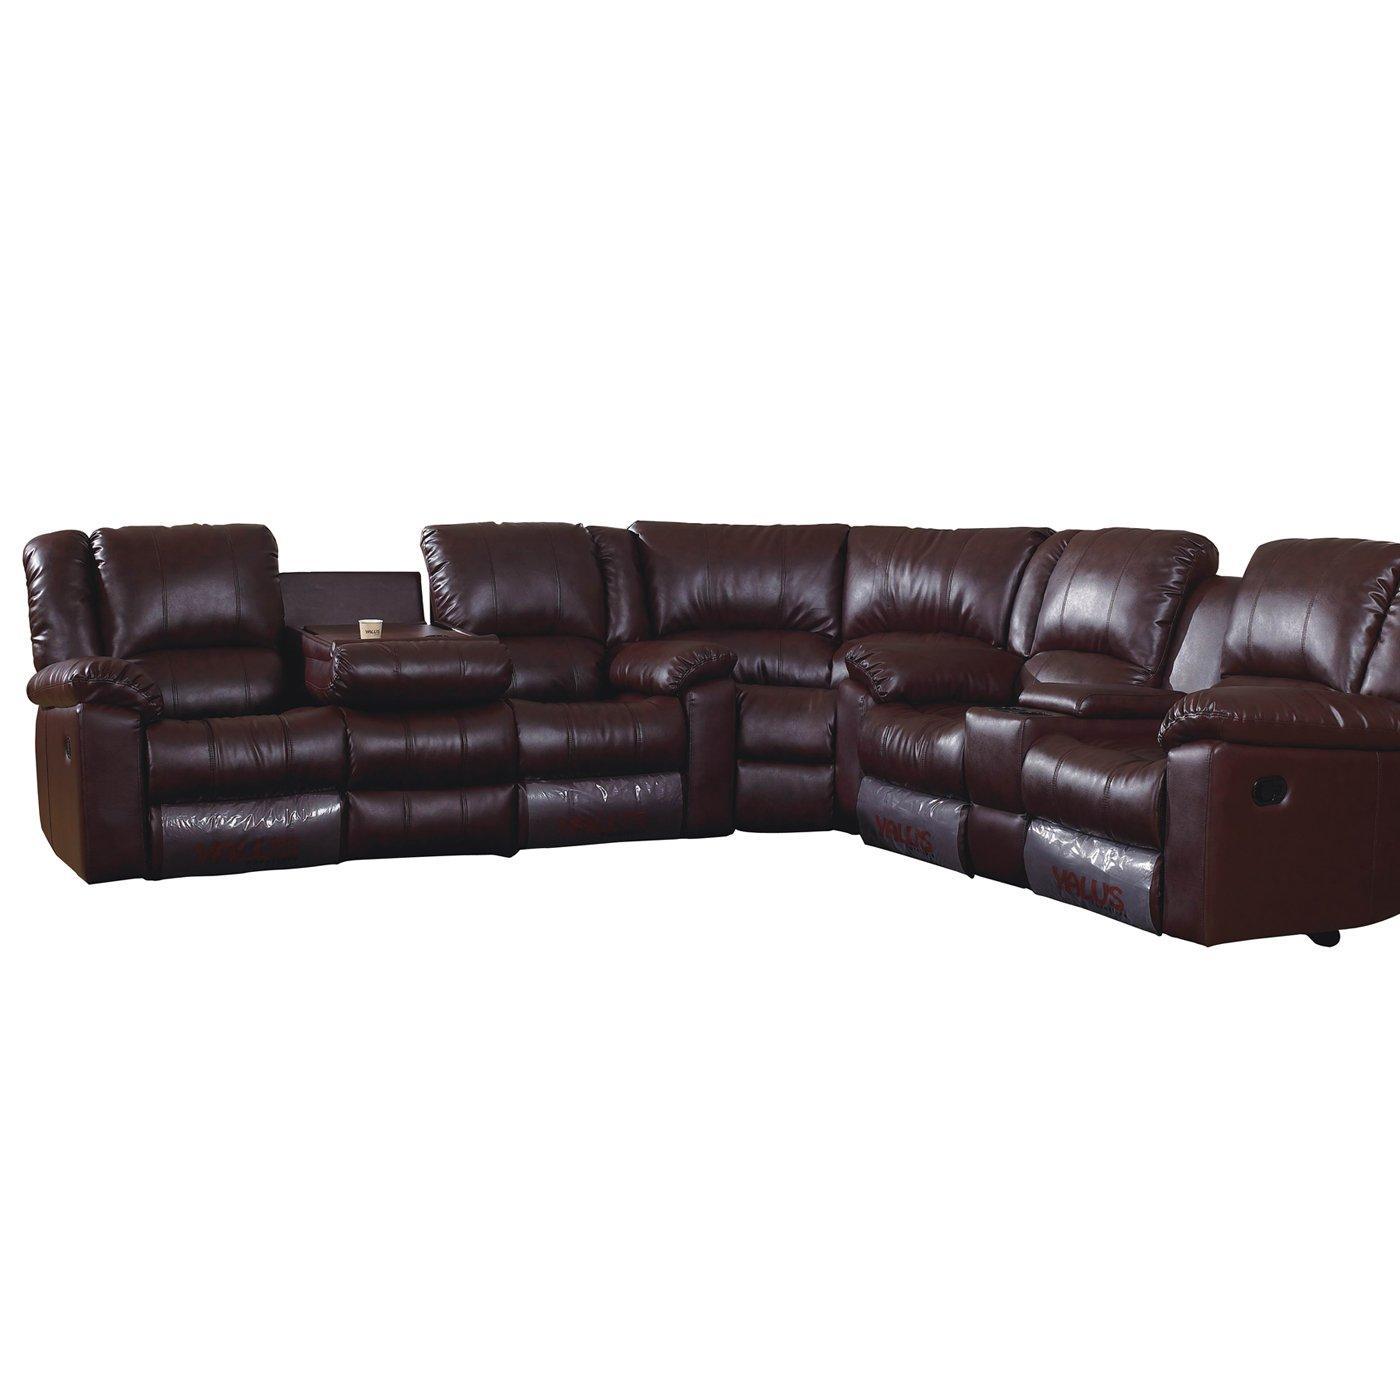 Wayside Sectional Reclining Sofa Set